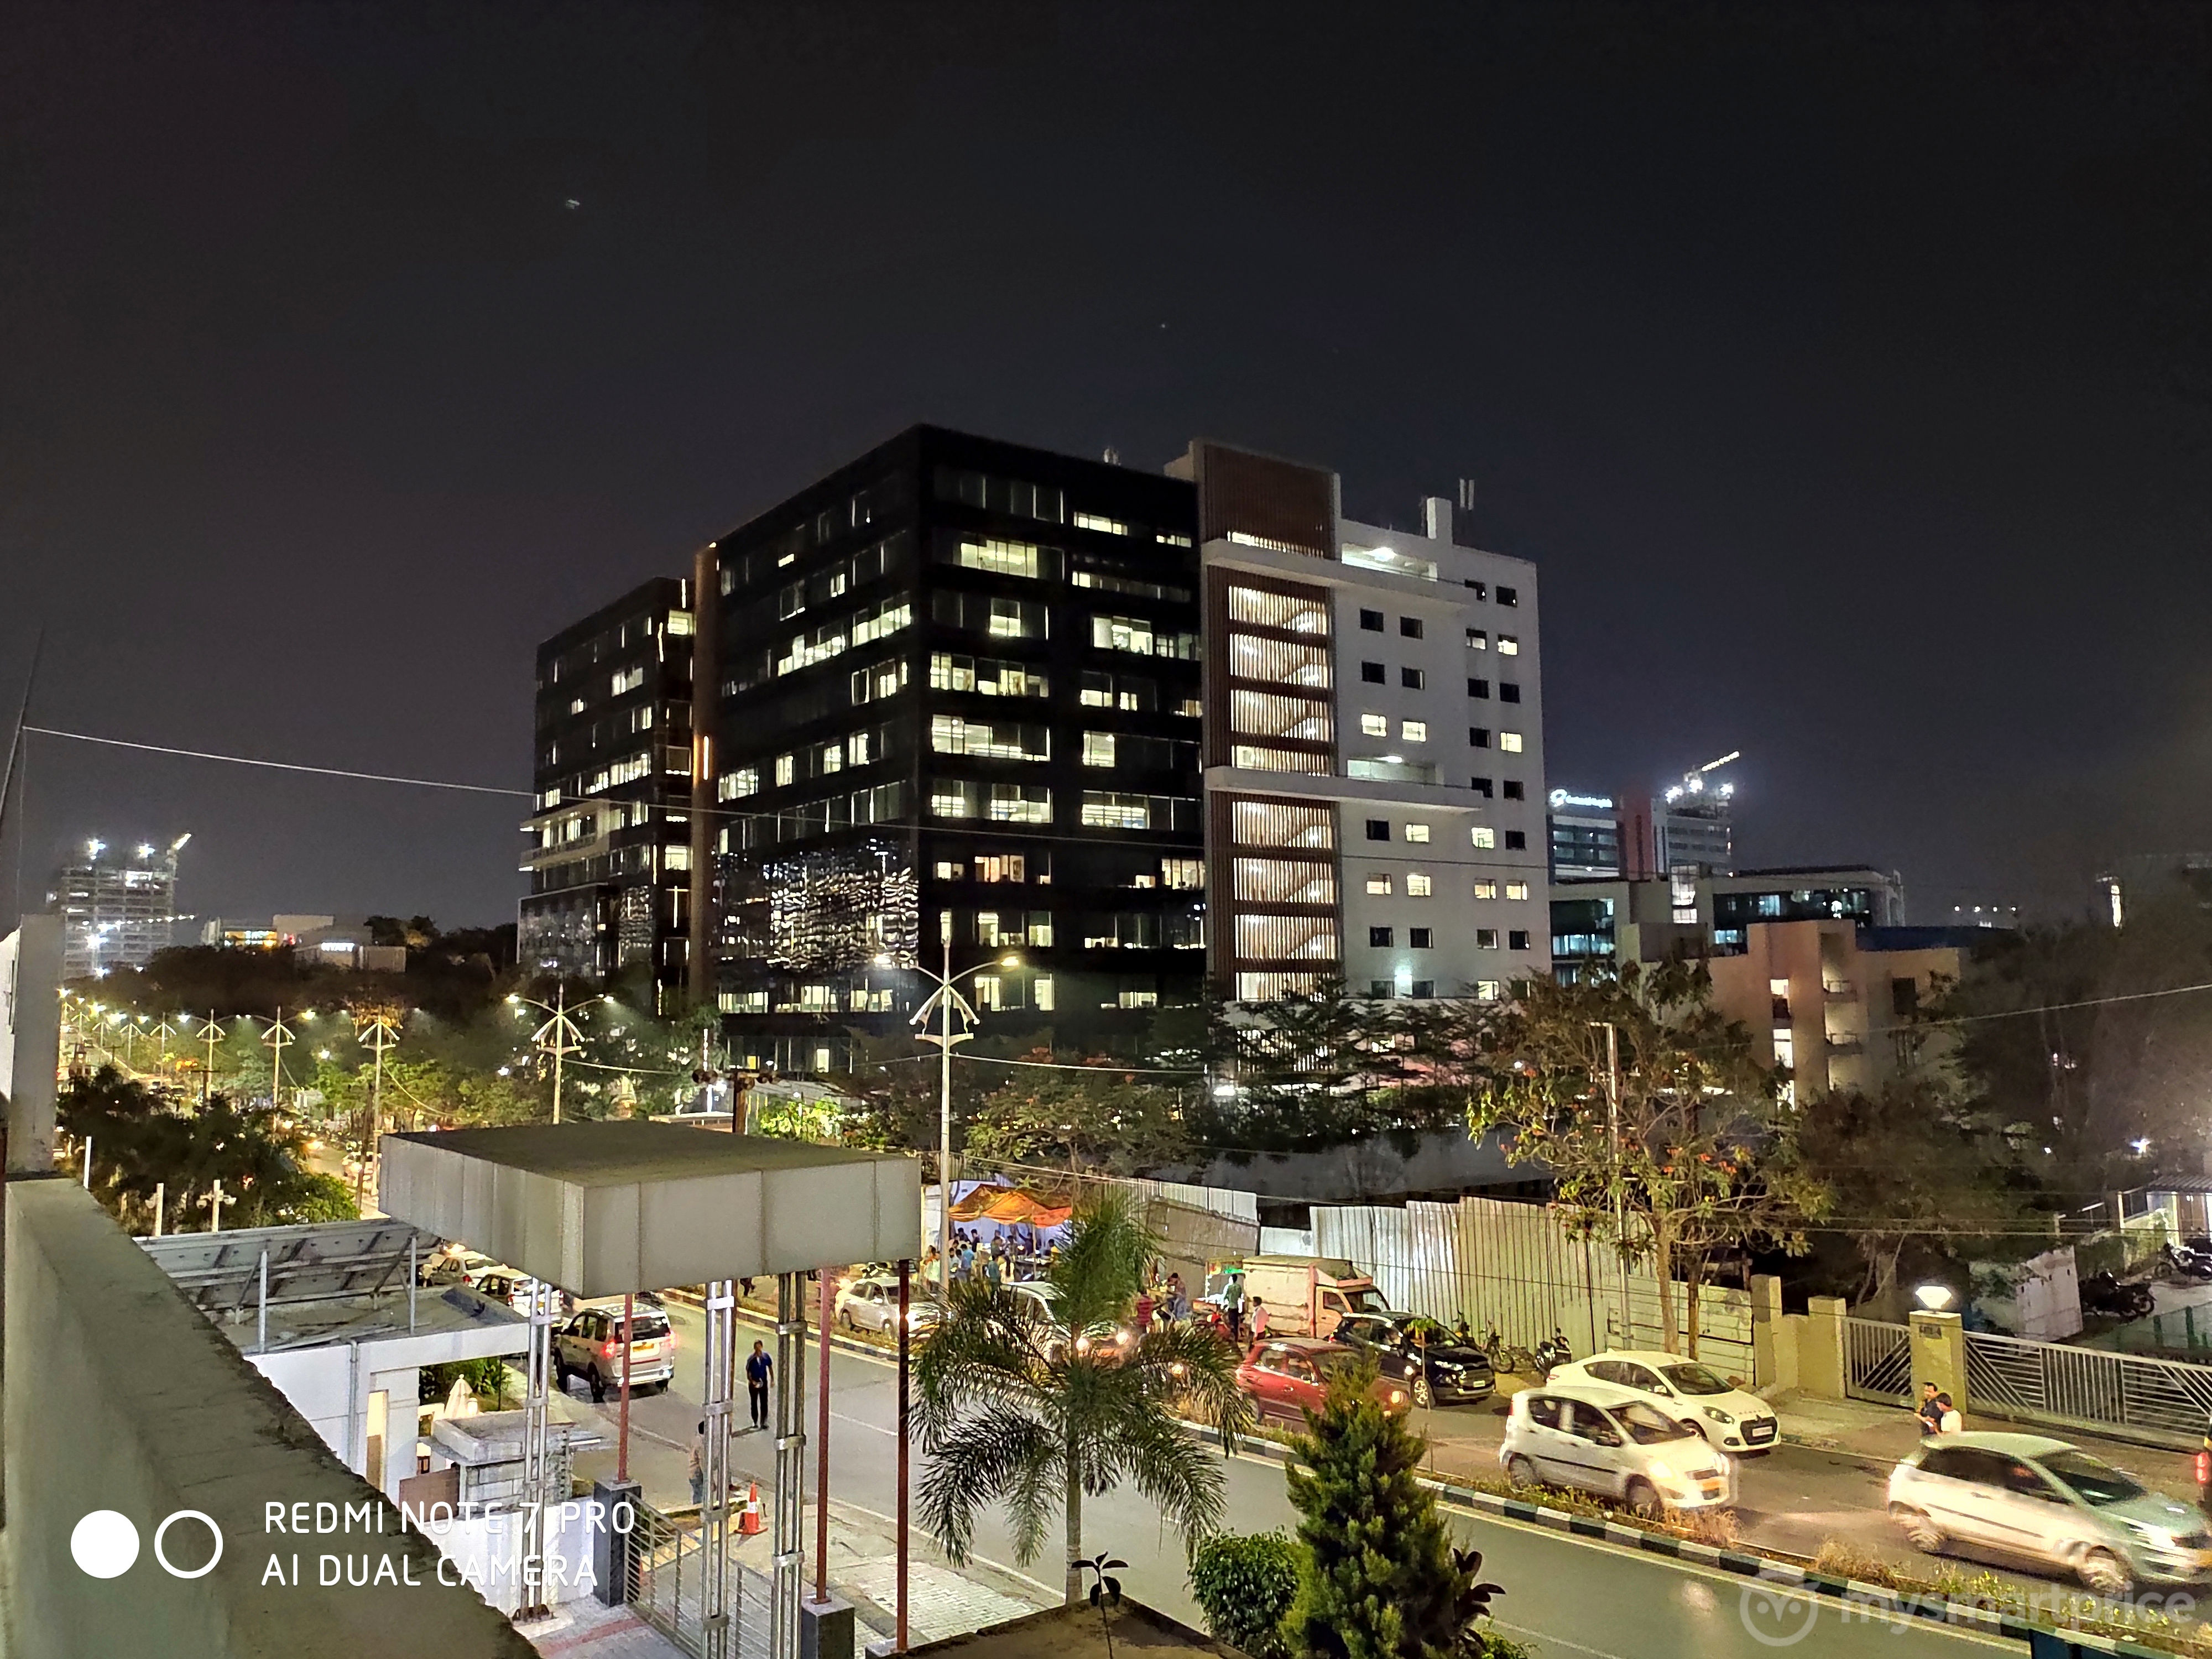 Xiaomi Redmi Note 7 Pro Lowlight Camera Sample 24 (Night Mode)